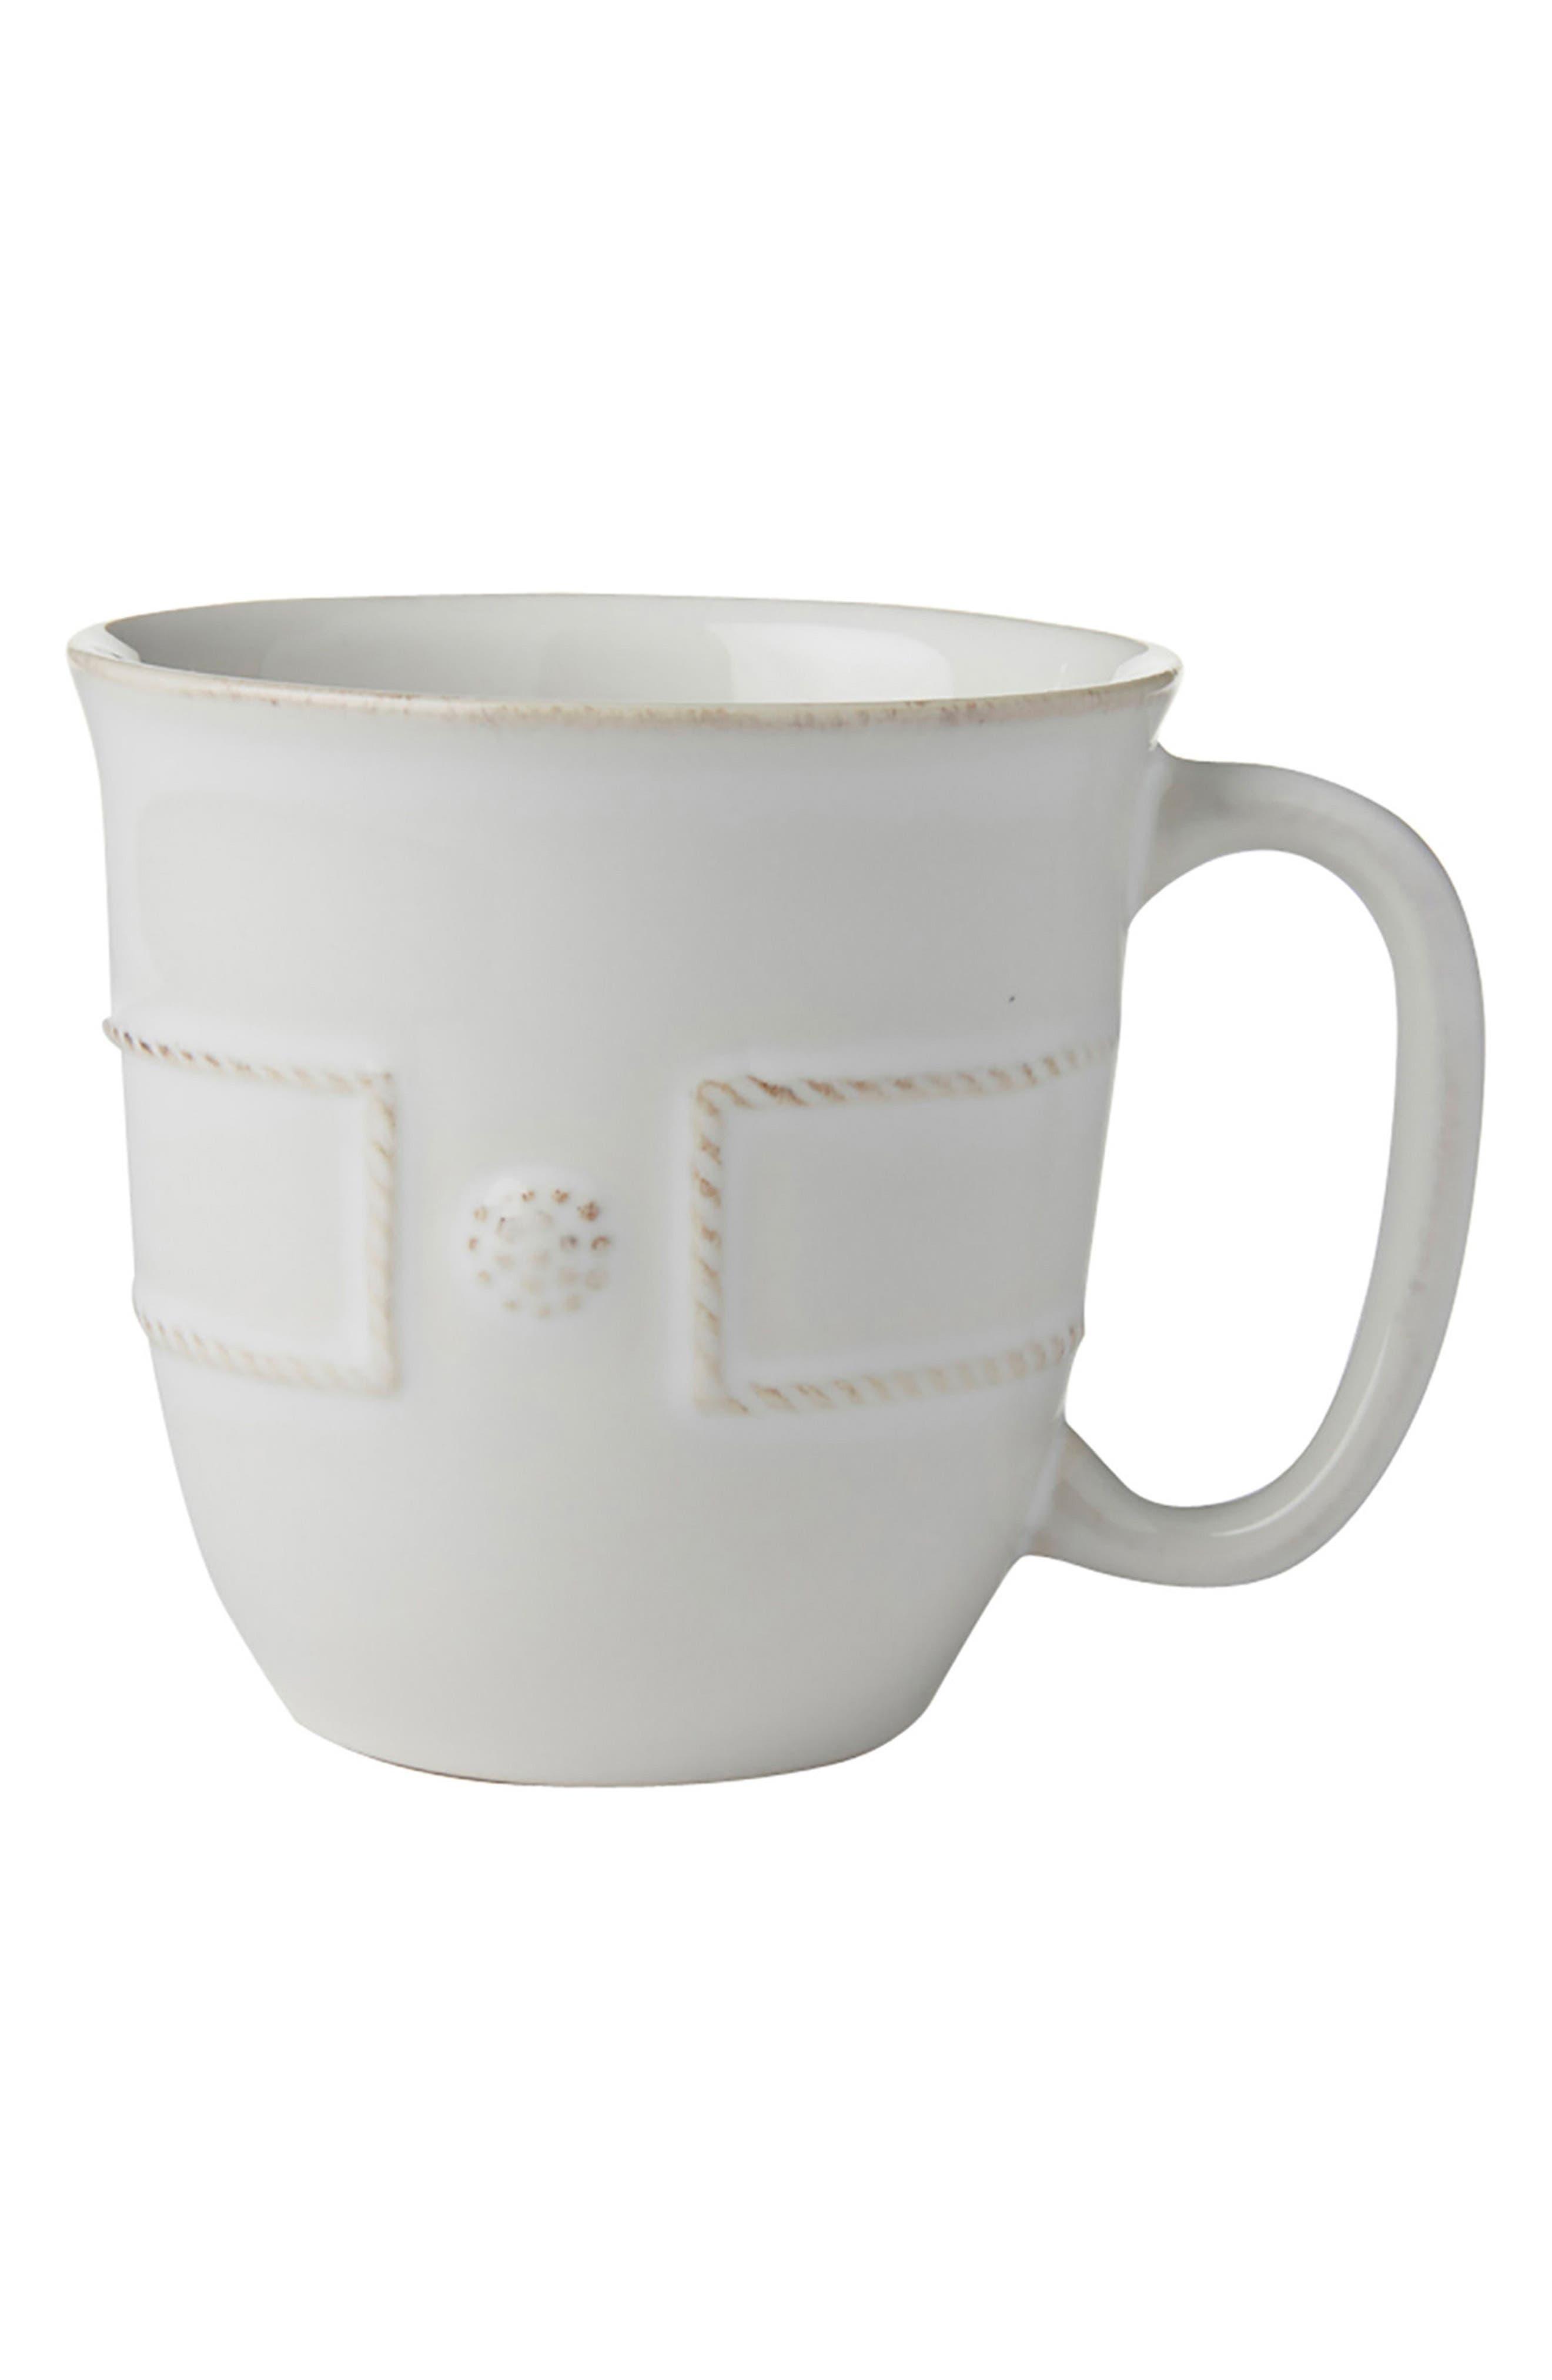 Main Image - Juliska Berry & Thread Ceramic Cup